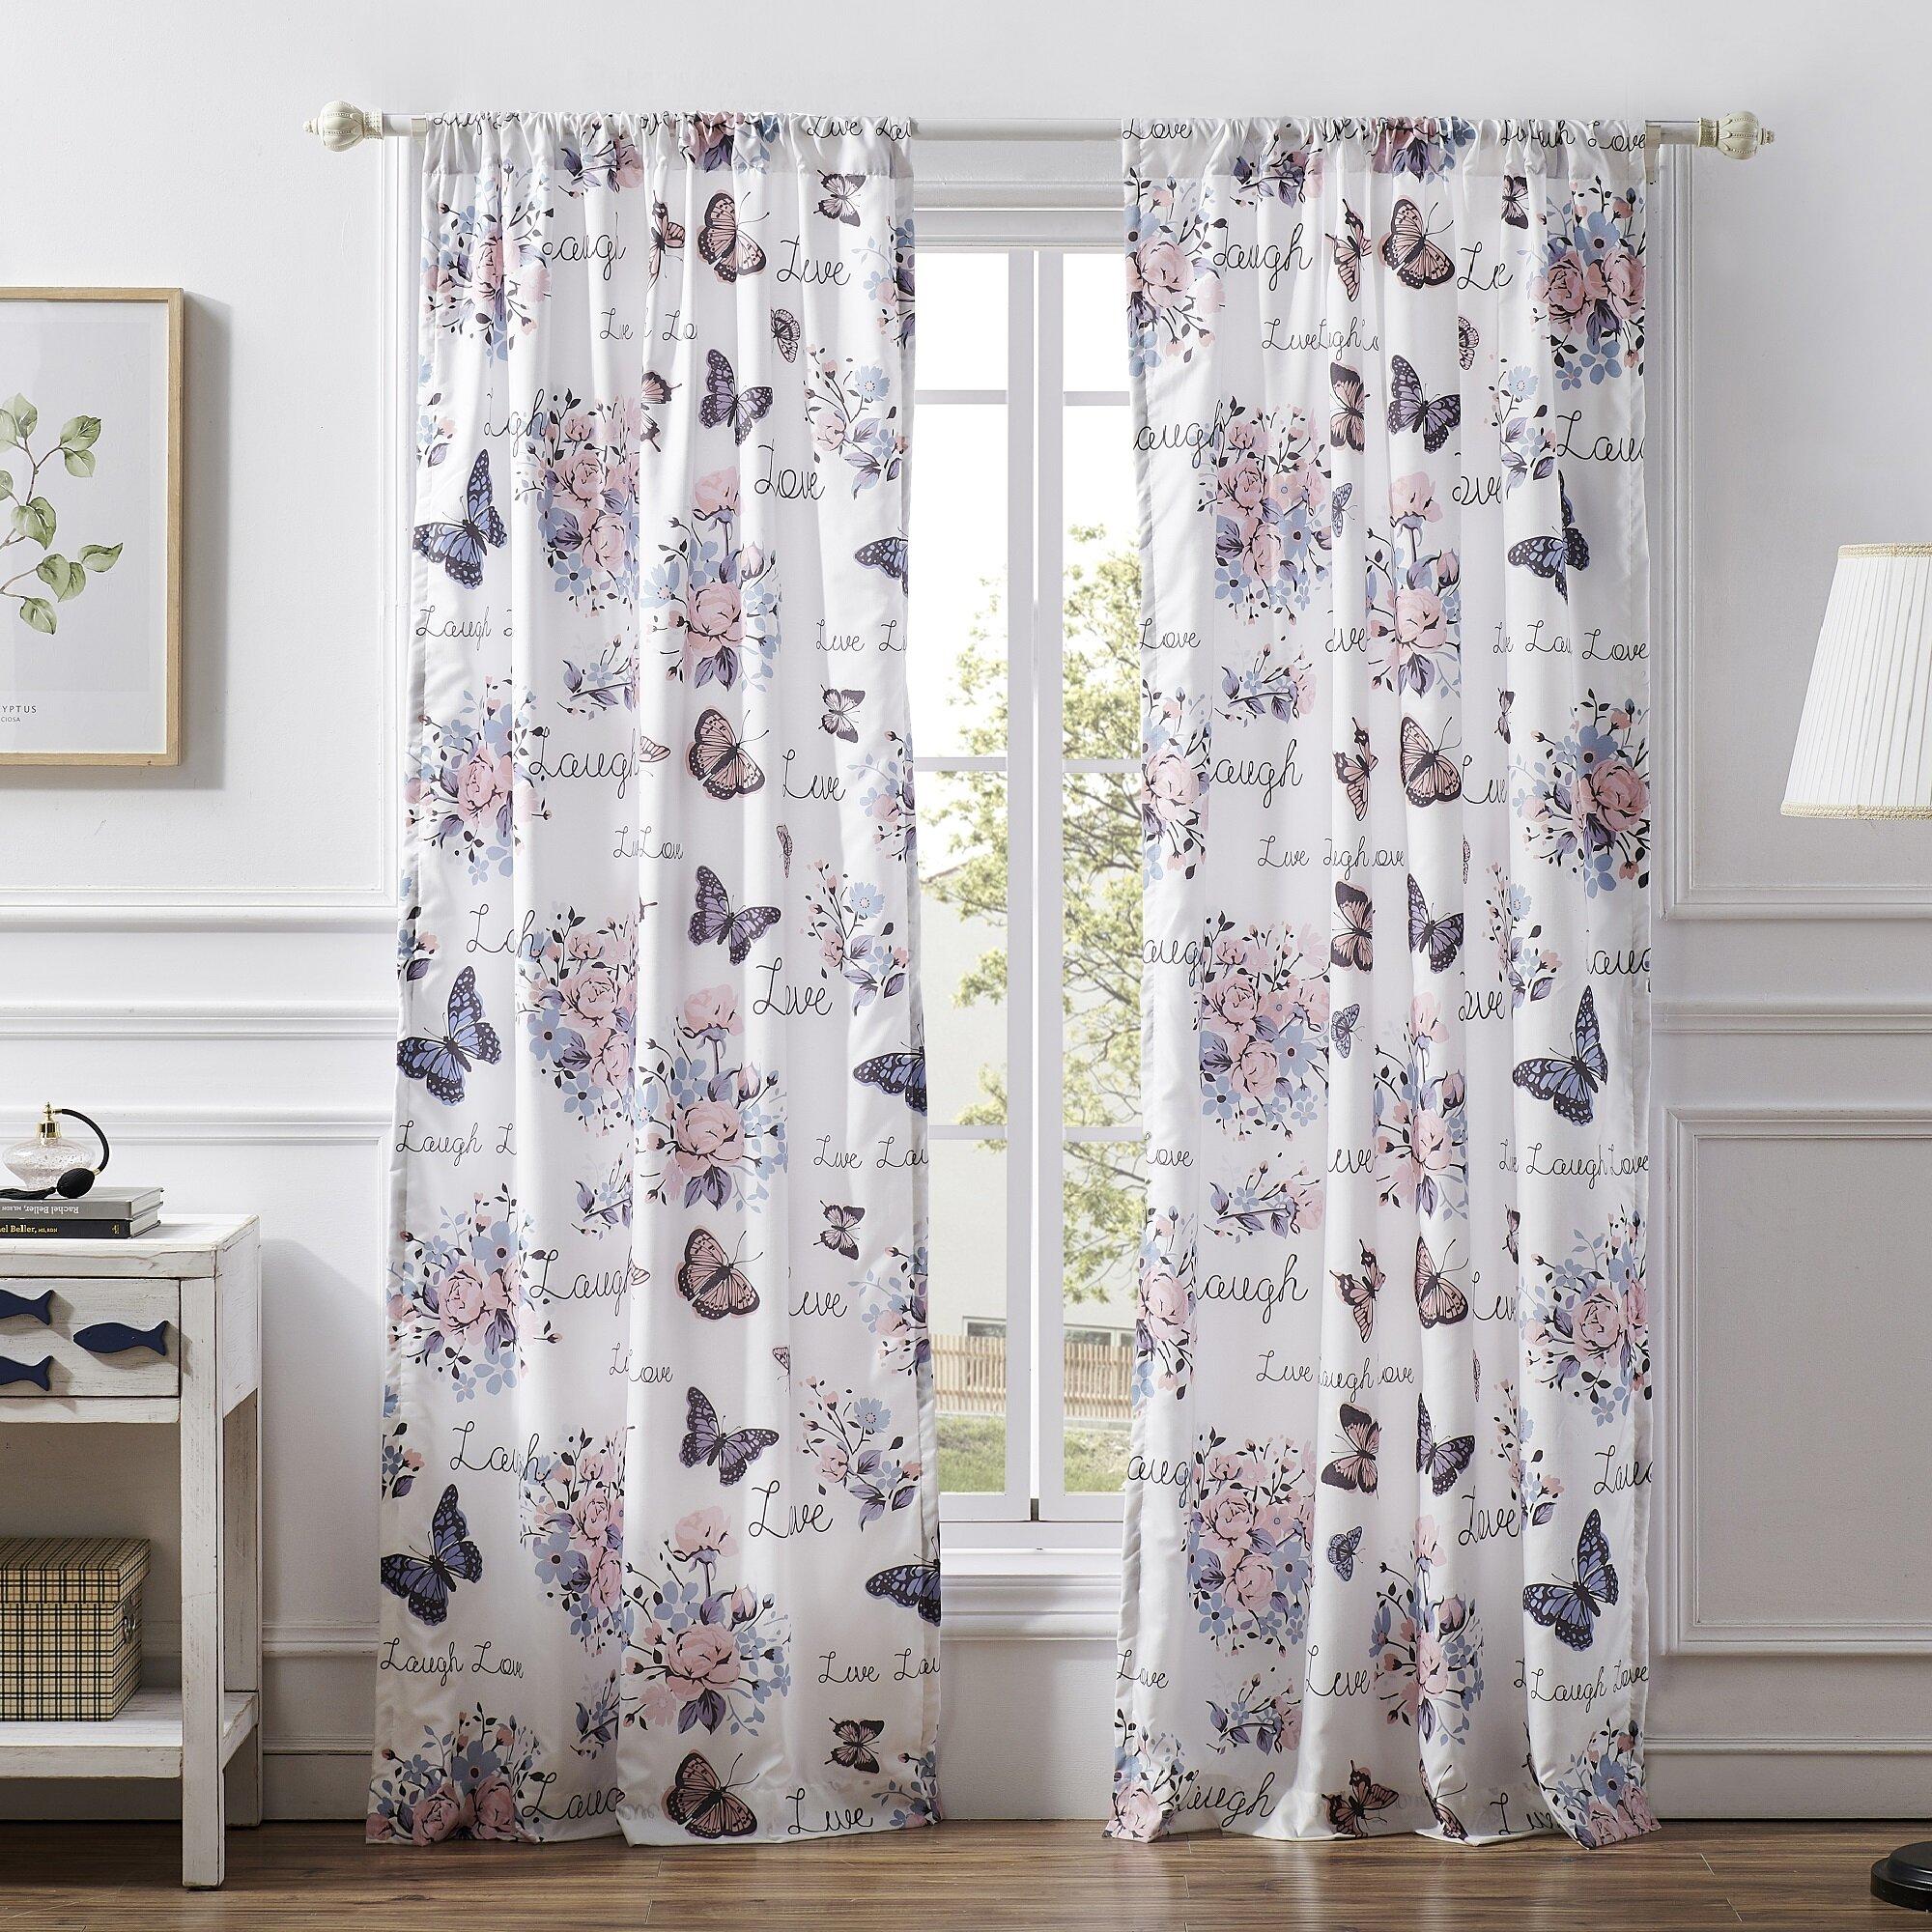 Red Barrel Studio Soud Garden Joy Floral Semi Sheer Rod Pocket Curtain Panel Reviews Wayfair